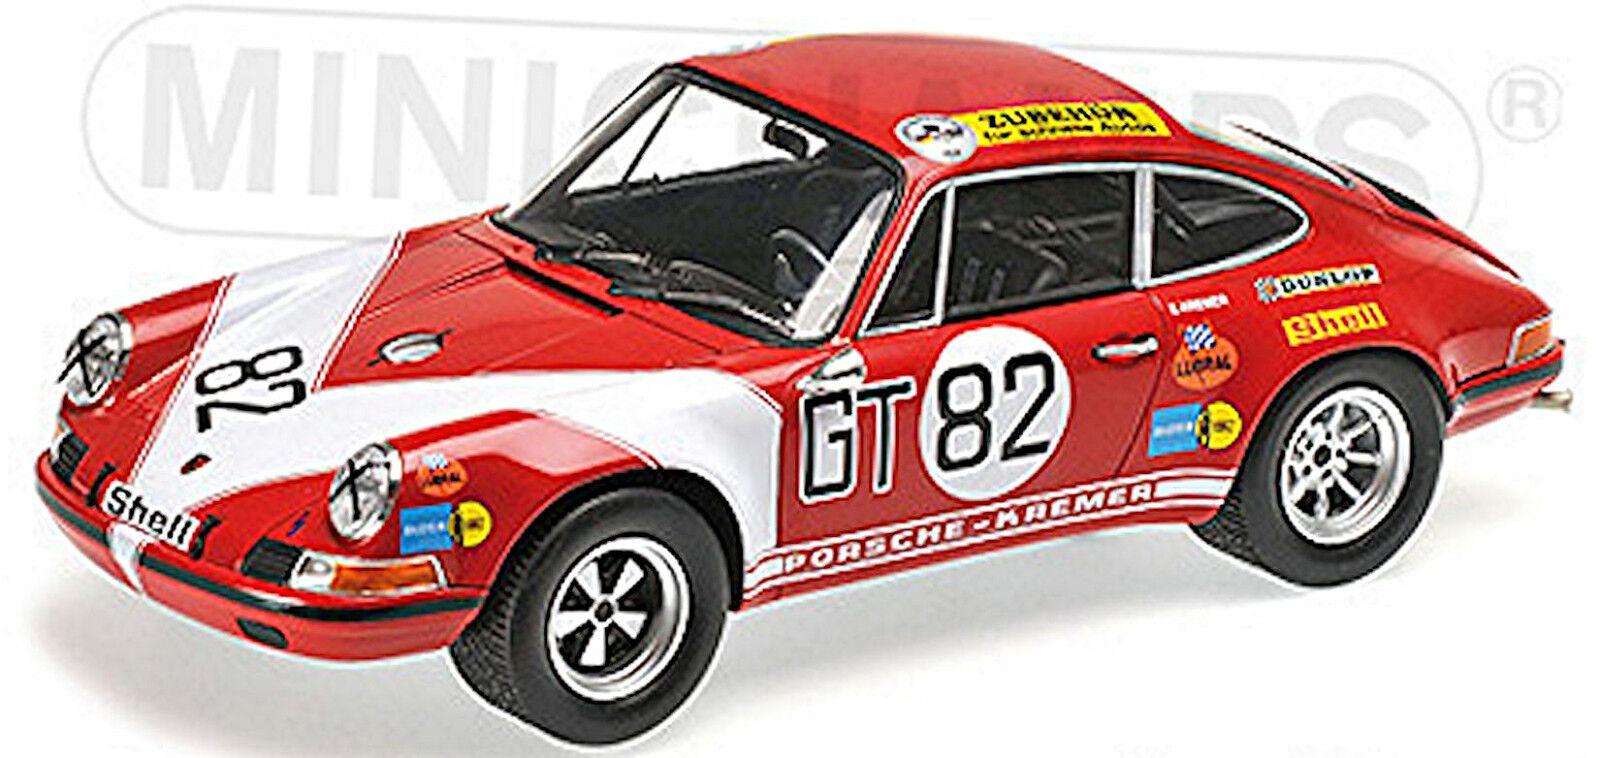 Porsche 911 S Kremer tävlings Team Vinnare 1971 Kremmer Neuhaus 1 18 Minic